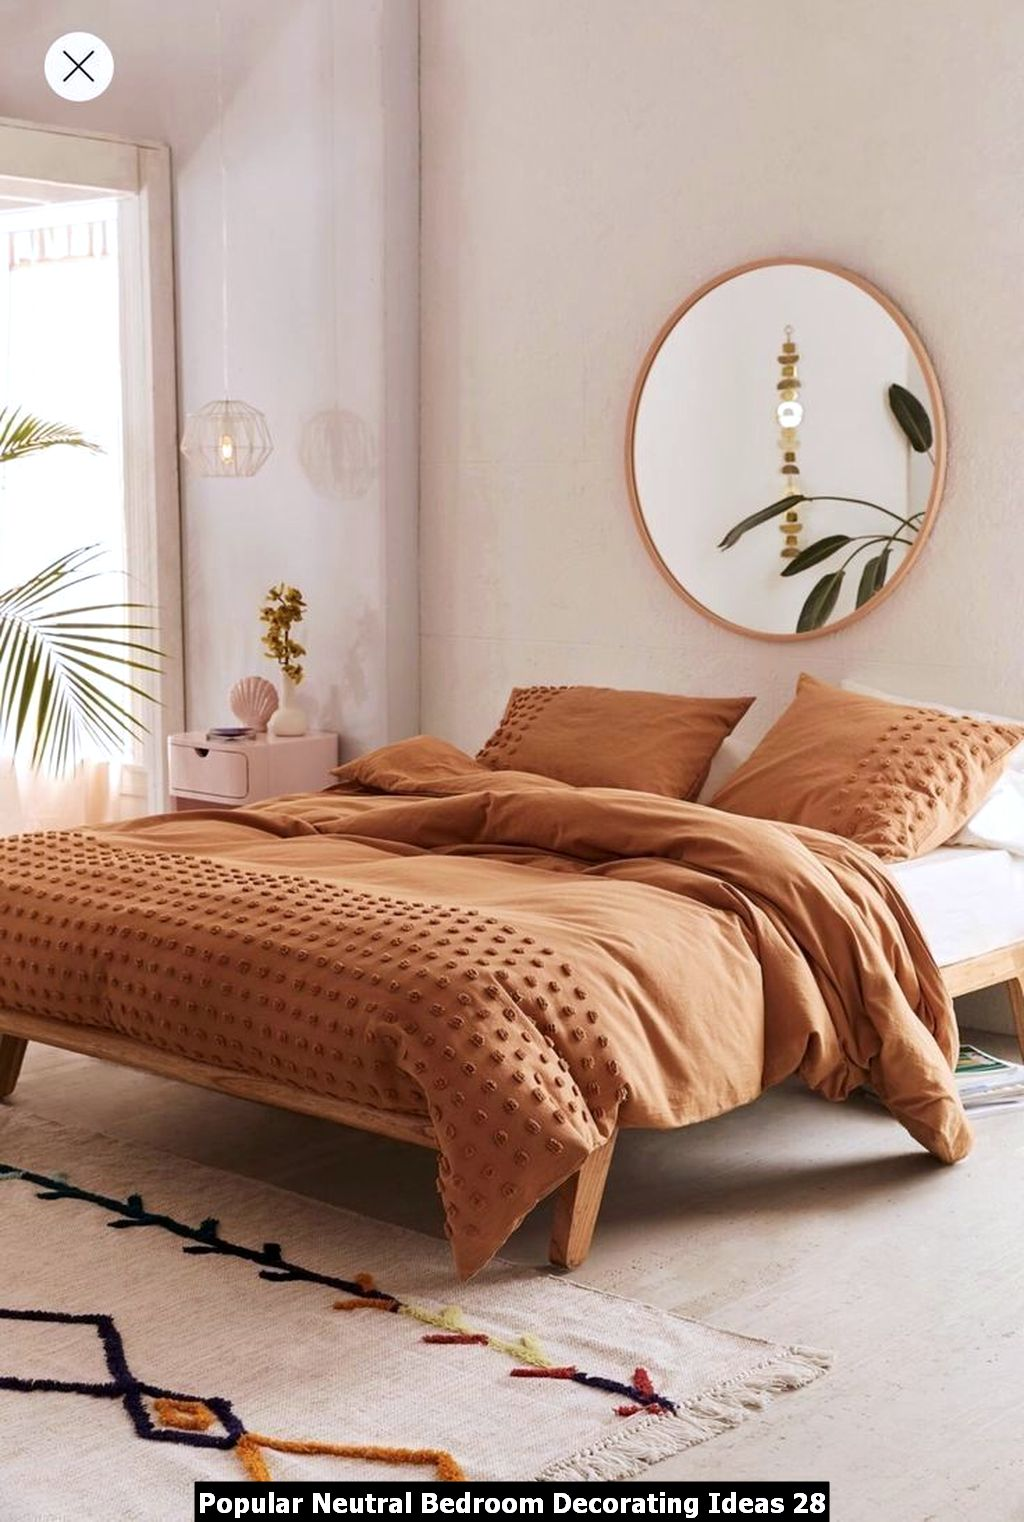 Popular Neutral Bedroom Decorating Ideas 28